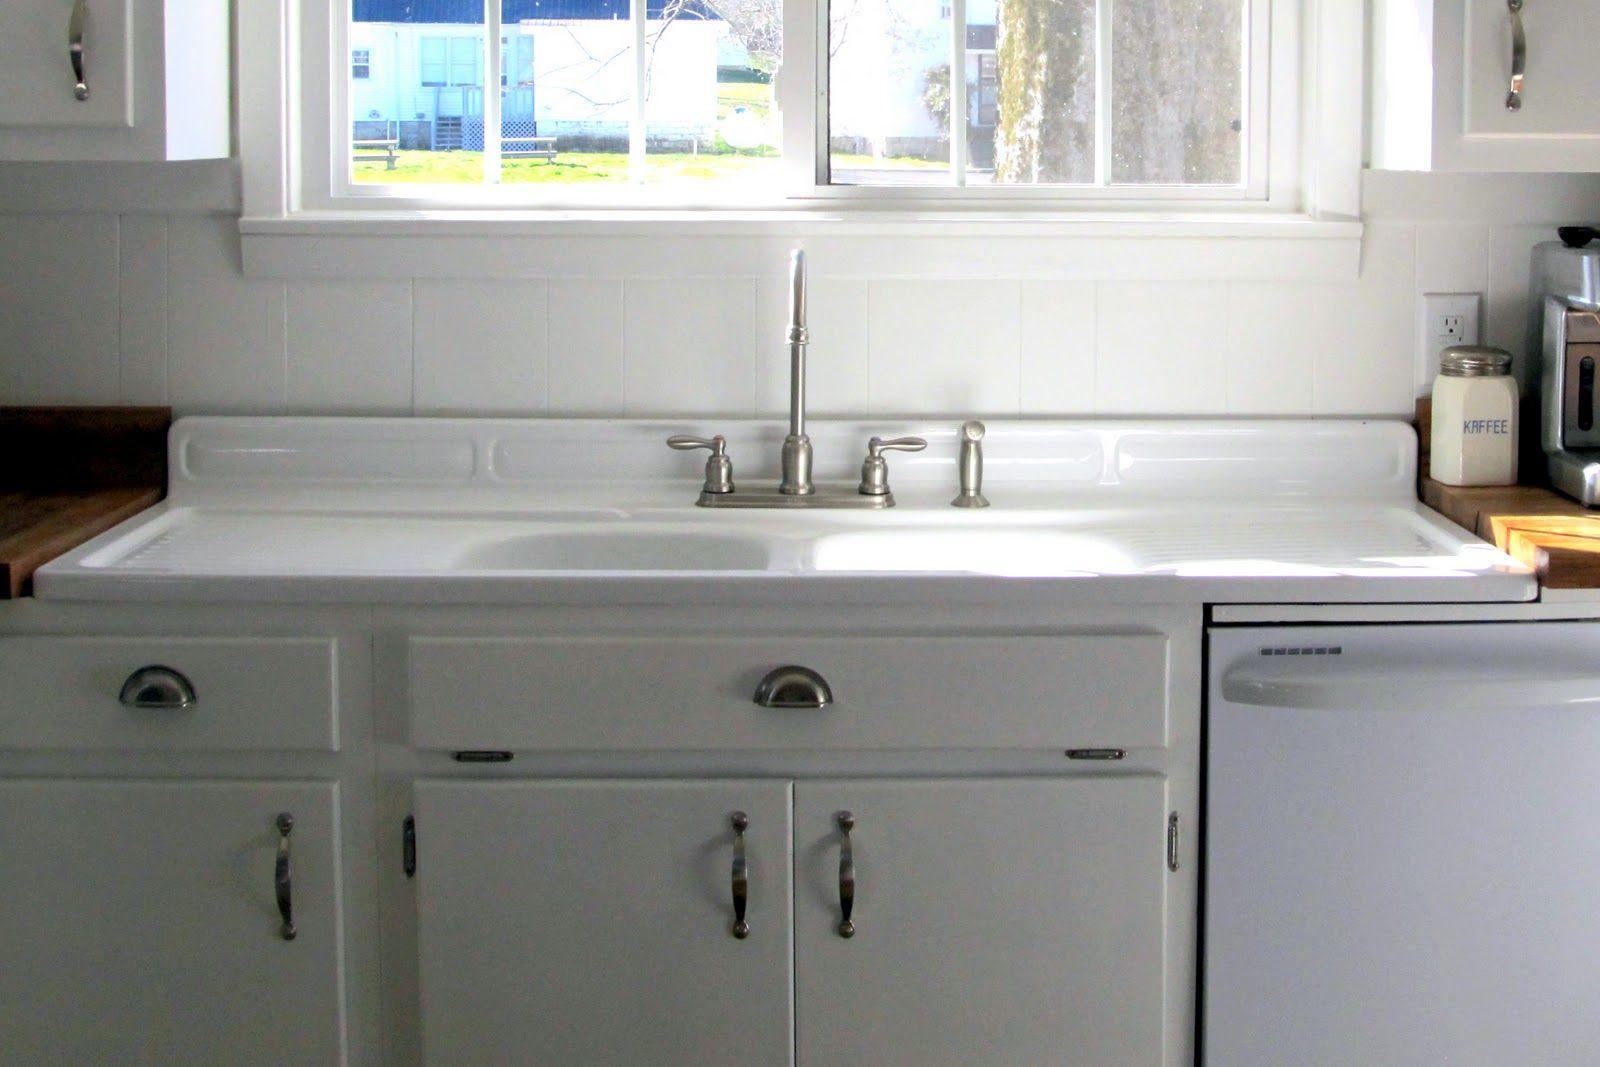 farmhouse sinks | Farmhouse Sink. Not pretty in those ...